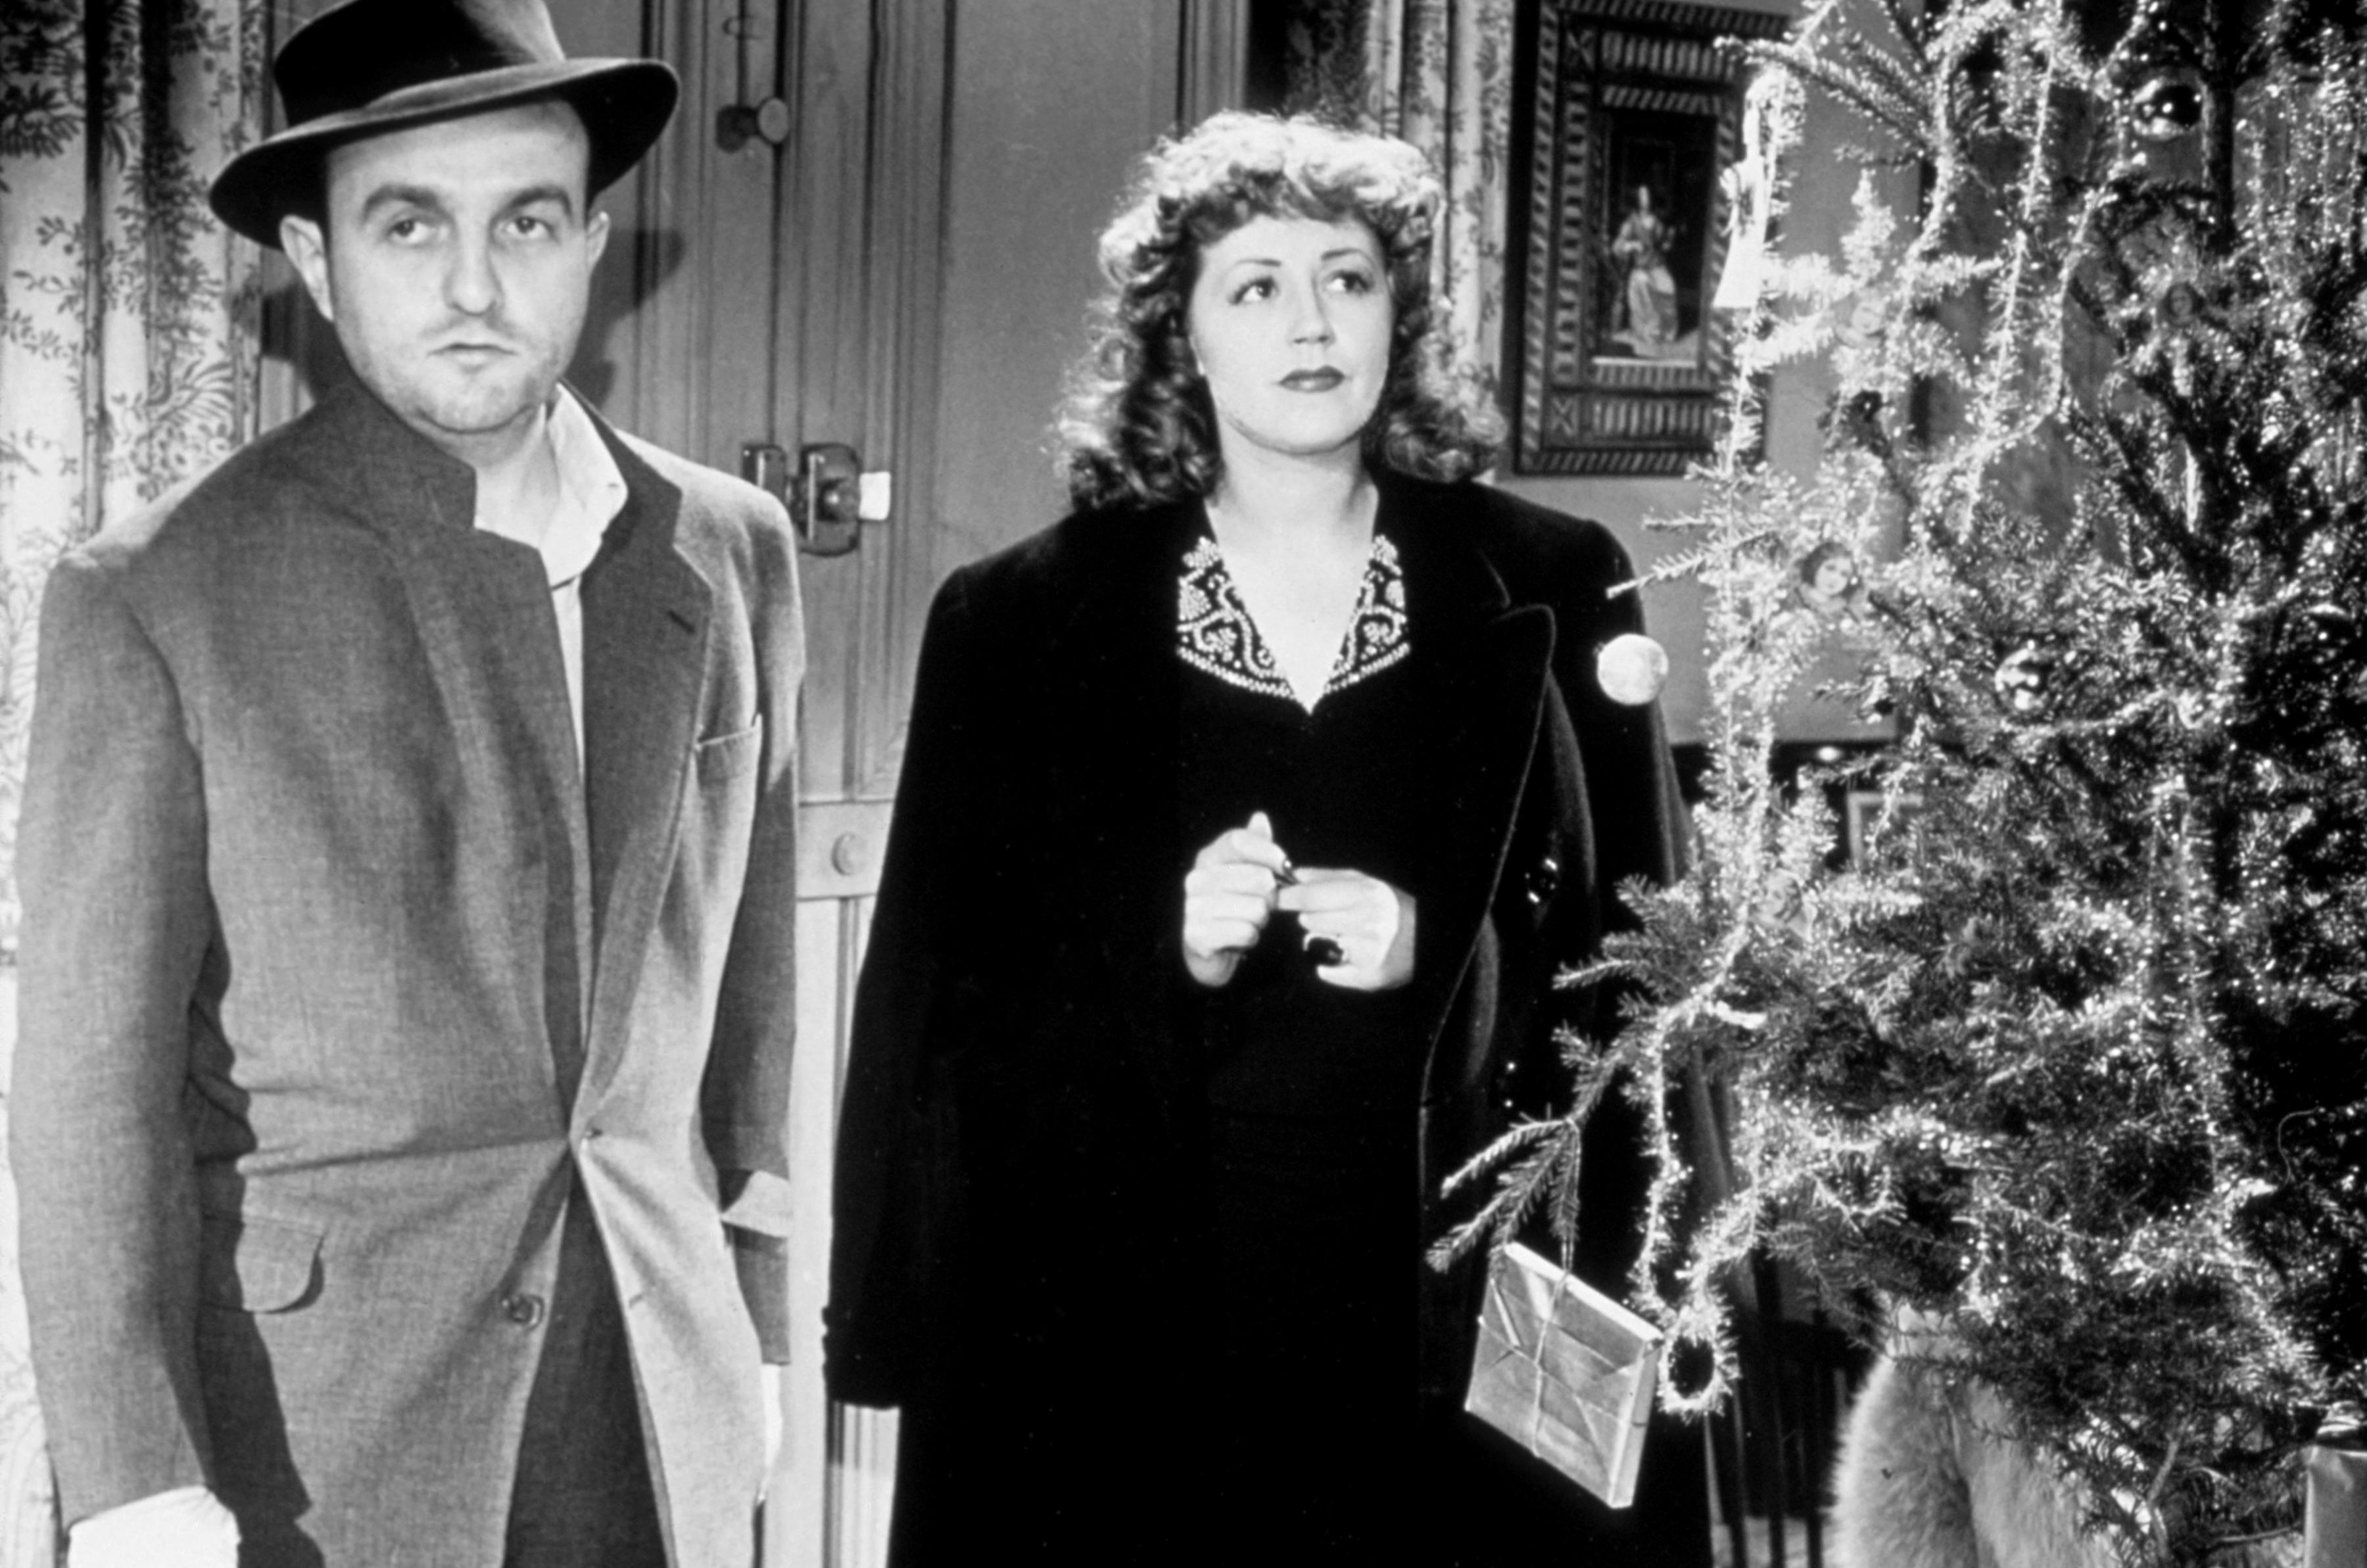 Bernard Blier and Suzy Delair in Quai des Orfèvres (1947)